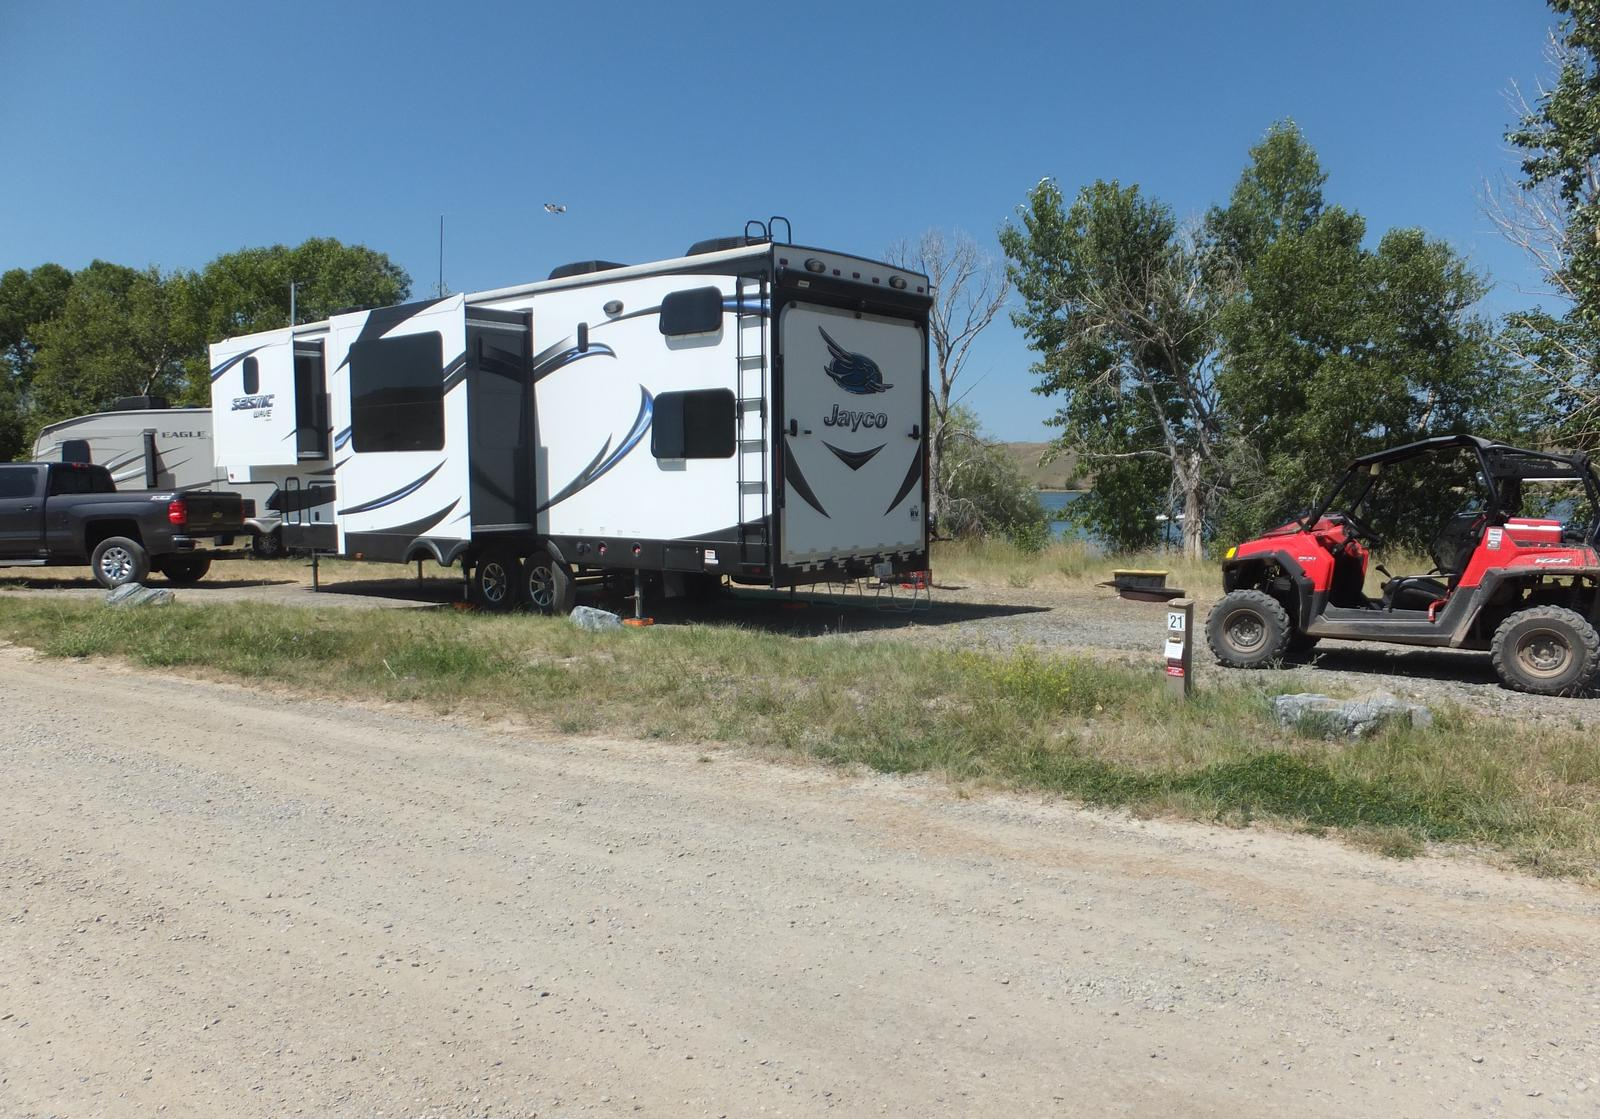 Hellgate Campground - Campsite 21